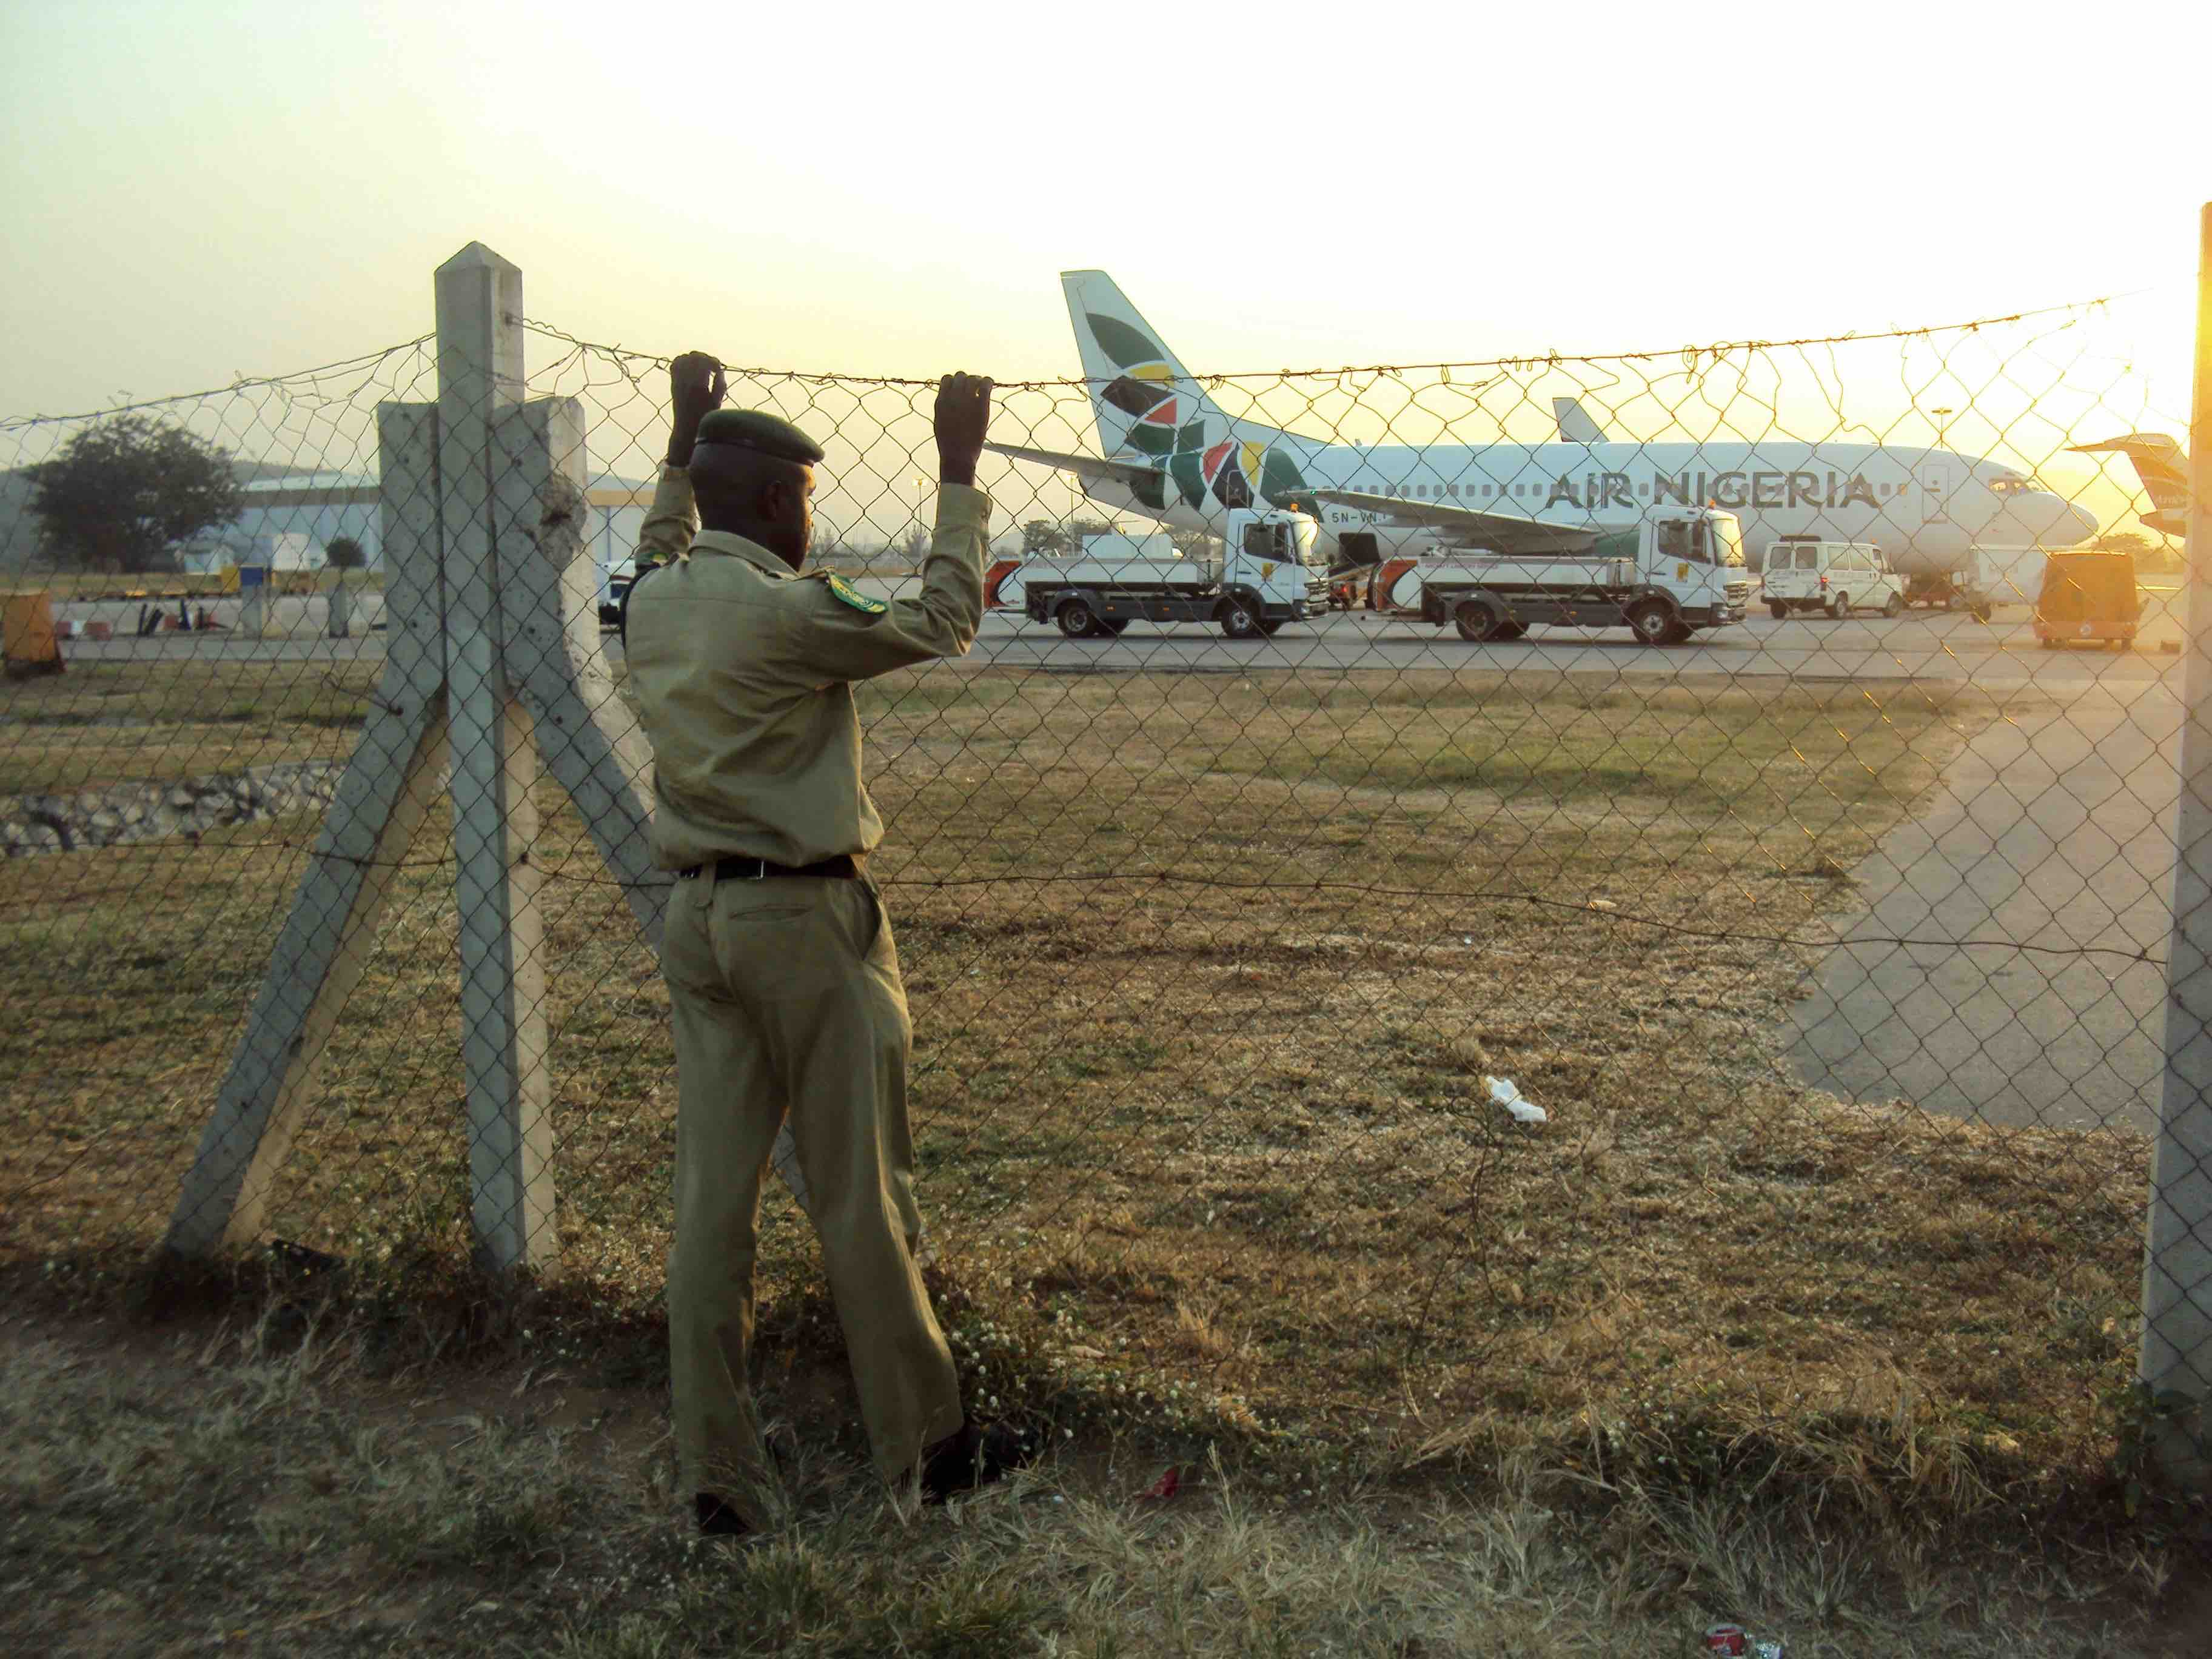 Air Nigeria, Nnamdi Azikiwe International Airport, FCT, Abuja, Nigeria. #JujuFilms